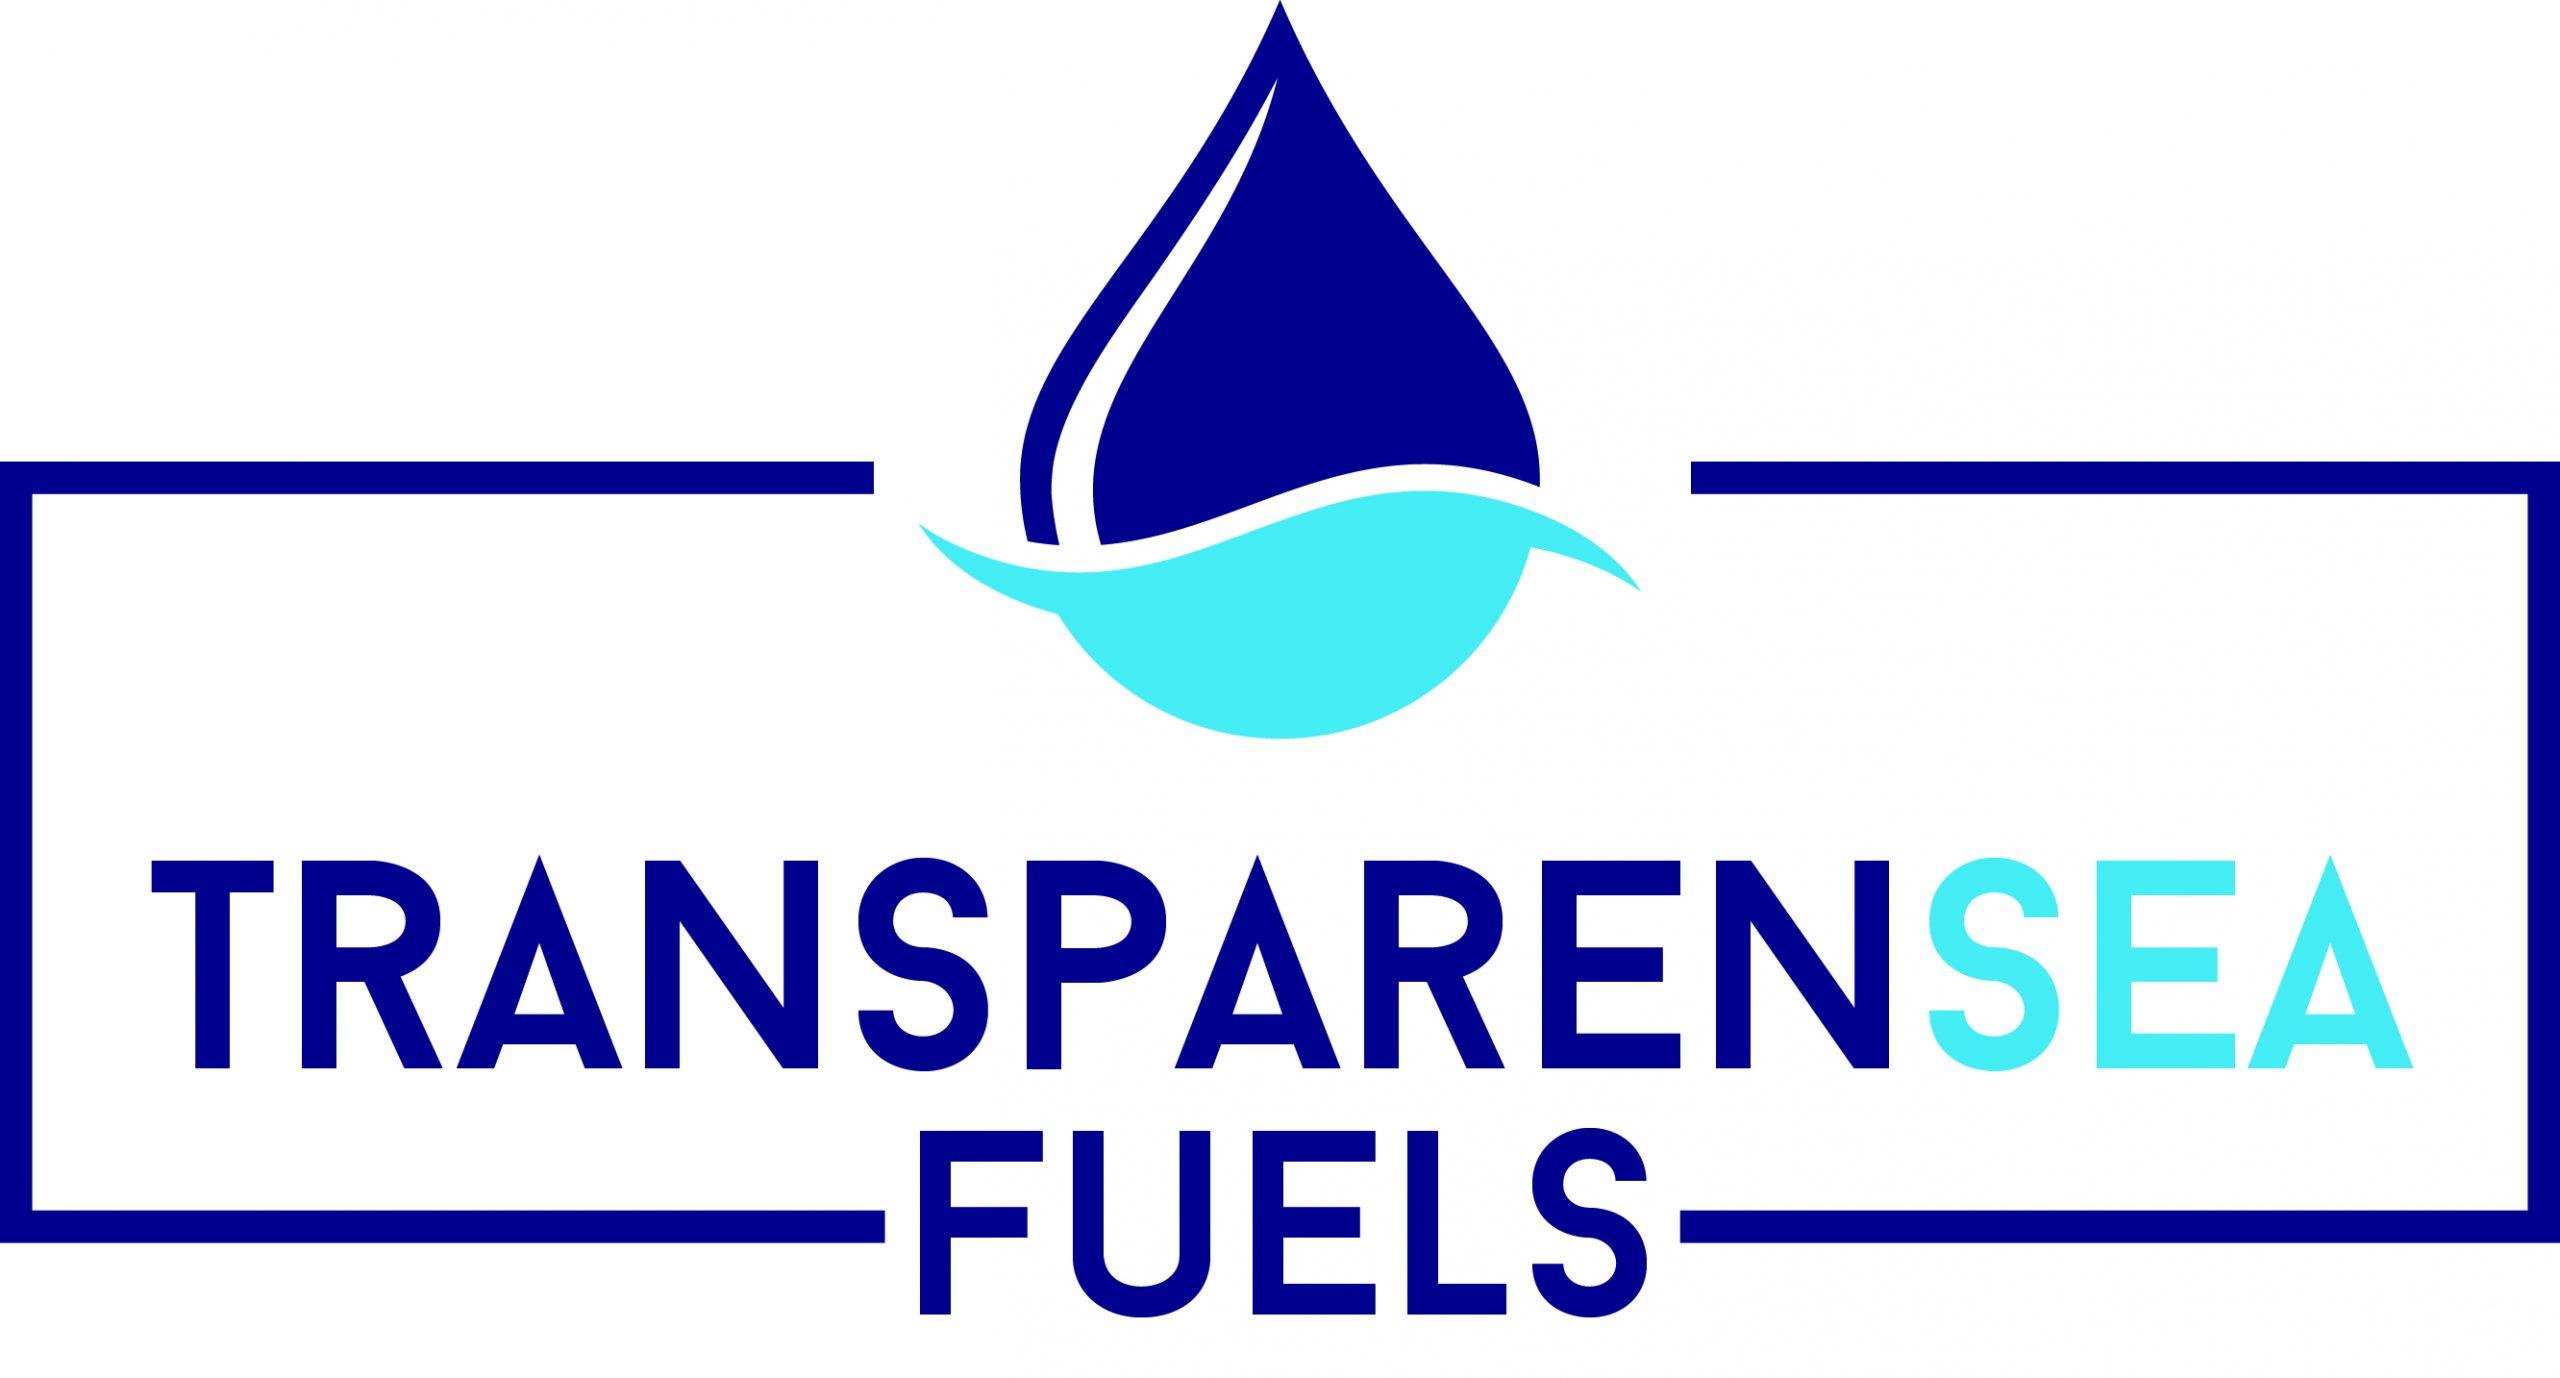 Transparensea Fuels